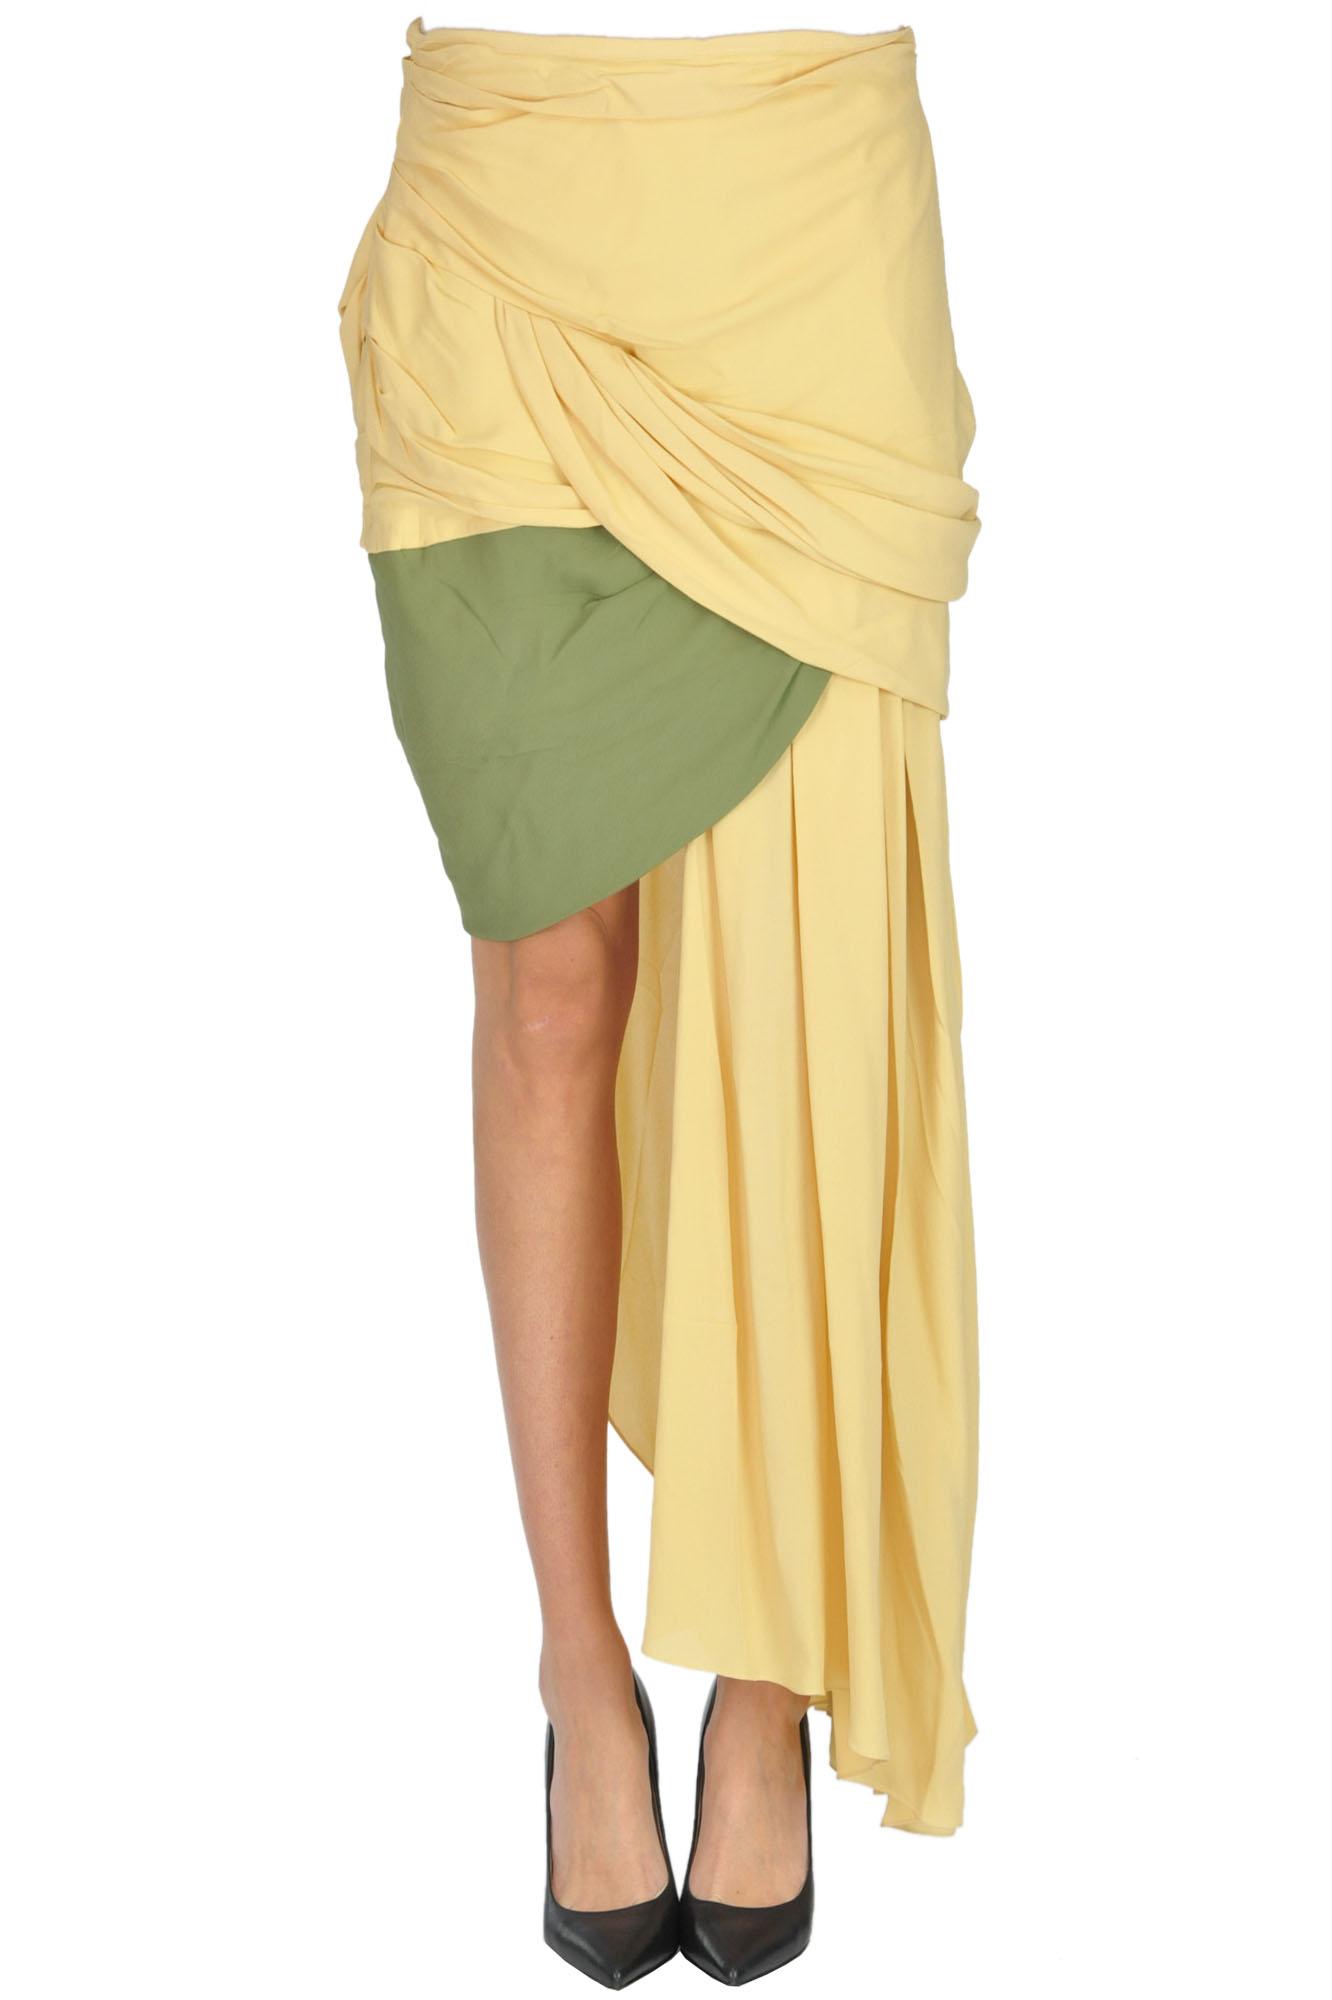 Jacquemus 'La Jupe Saaf' Asymmetric Skirt In Yellow